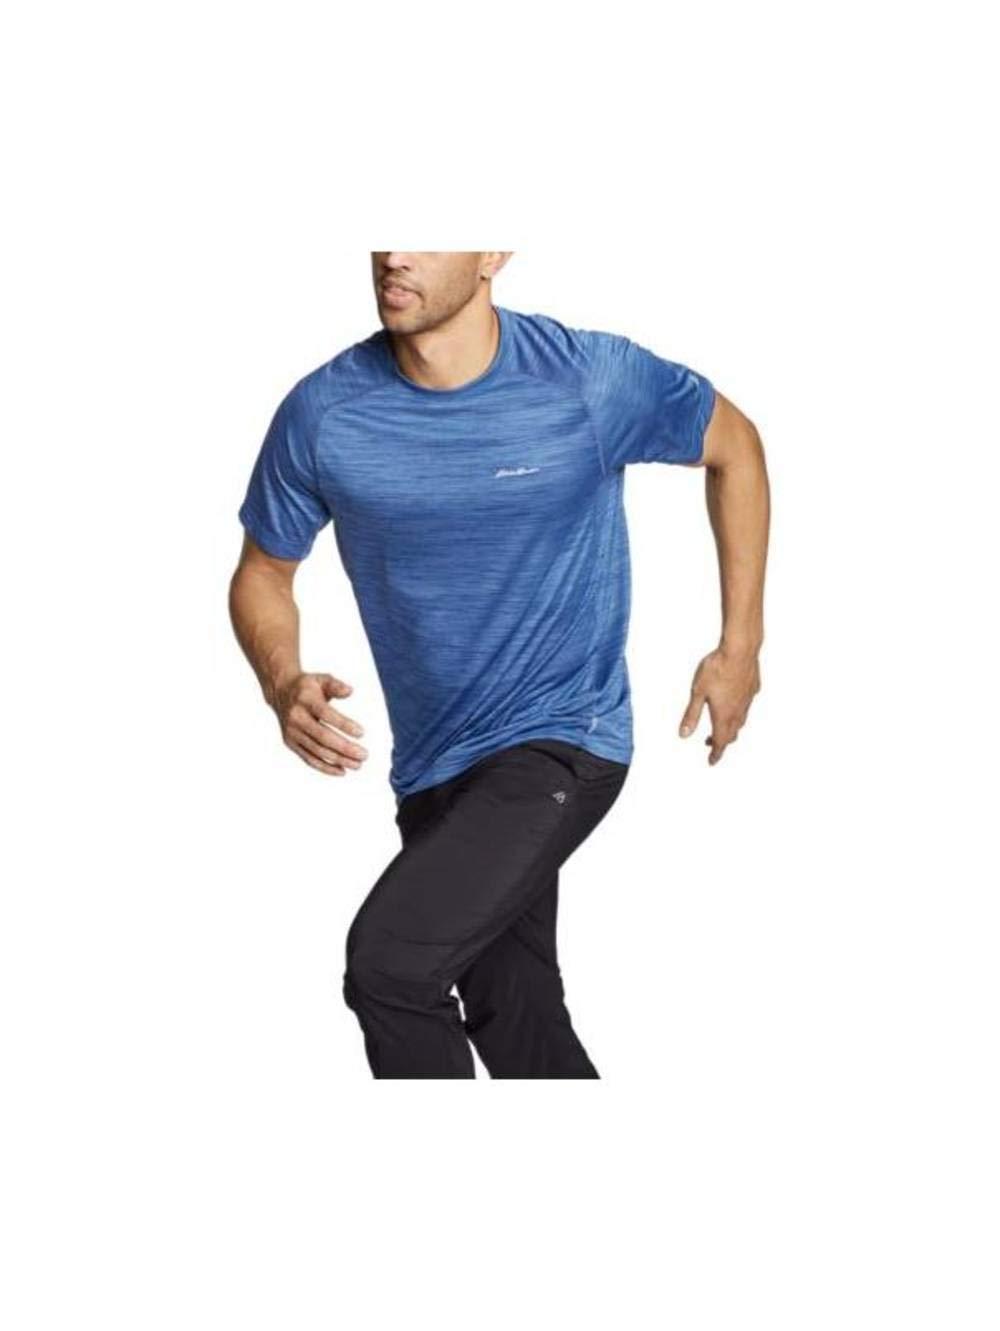 Eddie Bauer Men's Resolution Short-Sleeve T-Shirt, Lake Regular S